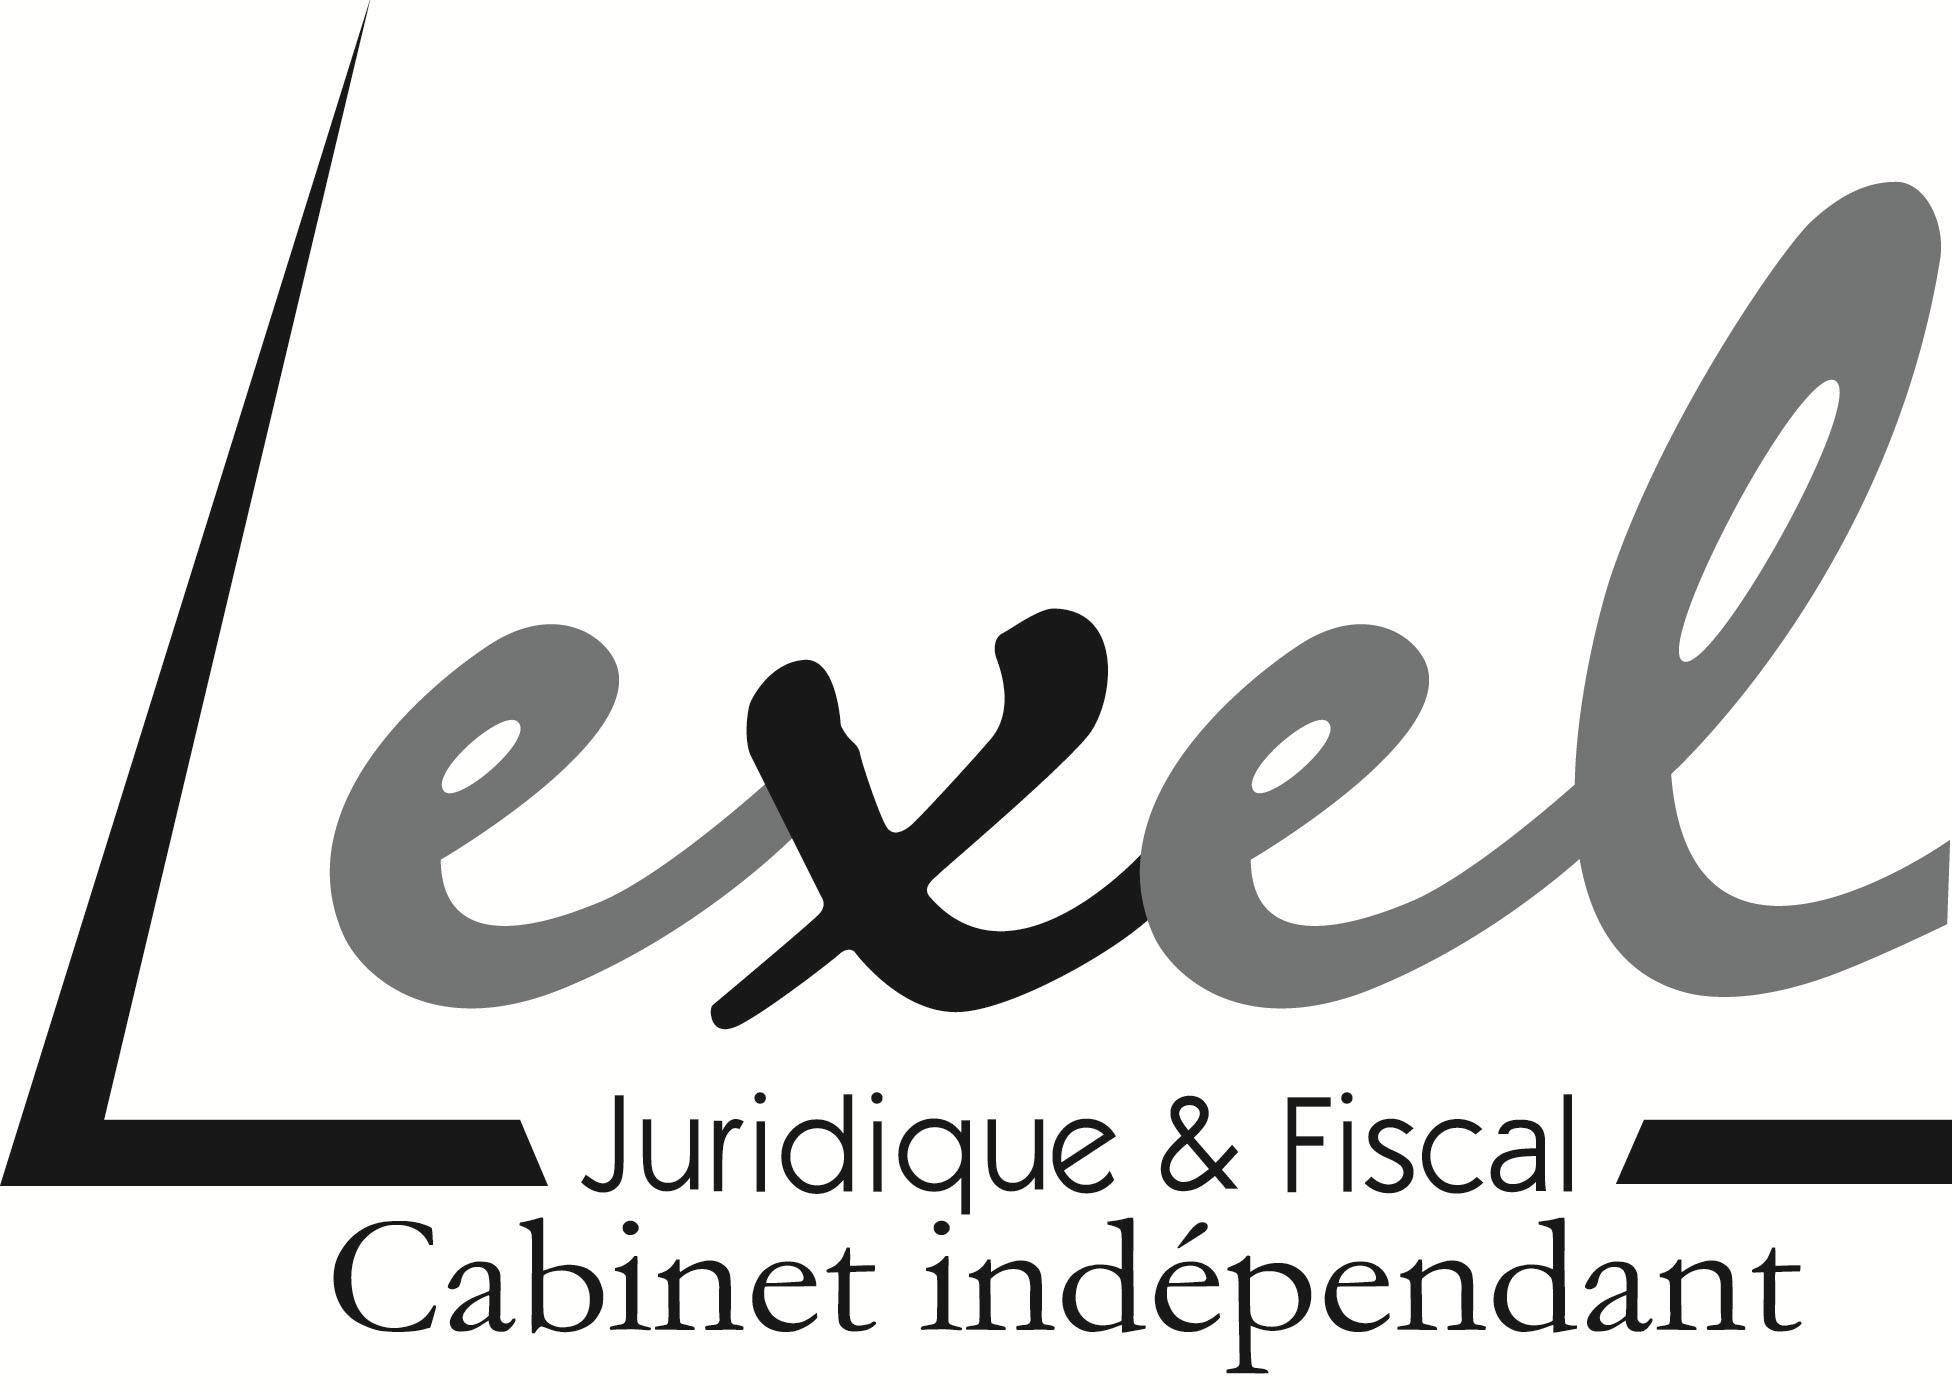 Lexel Juridique & Fiscal logo